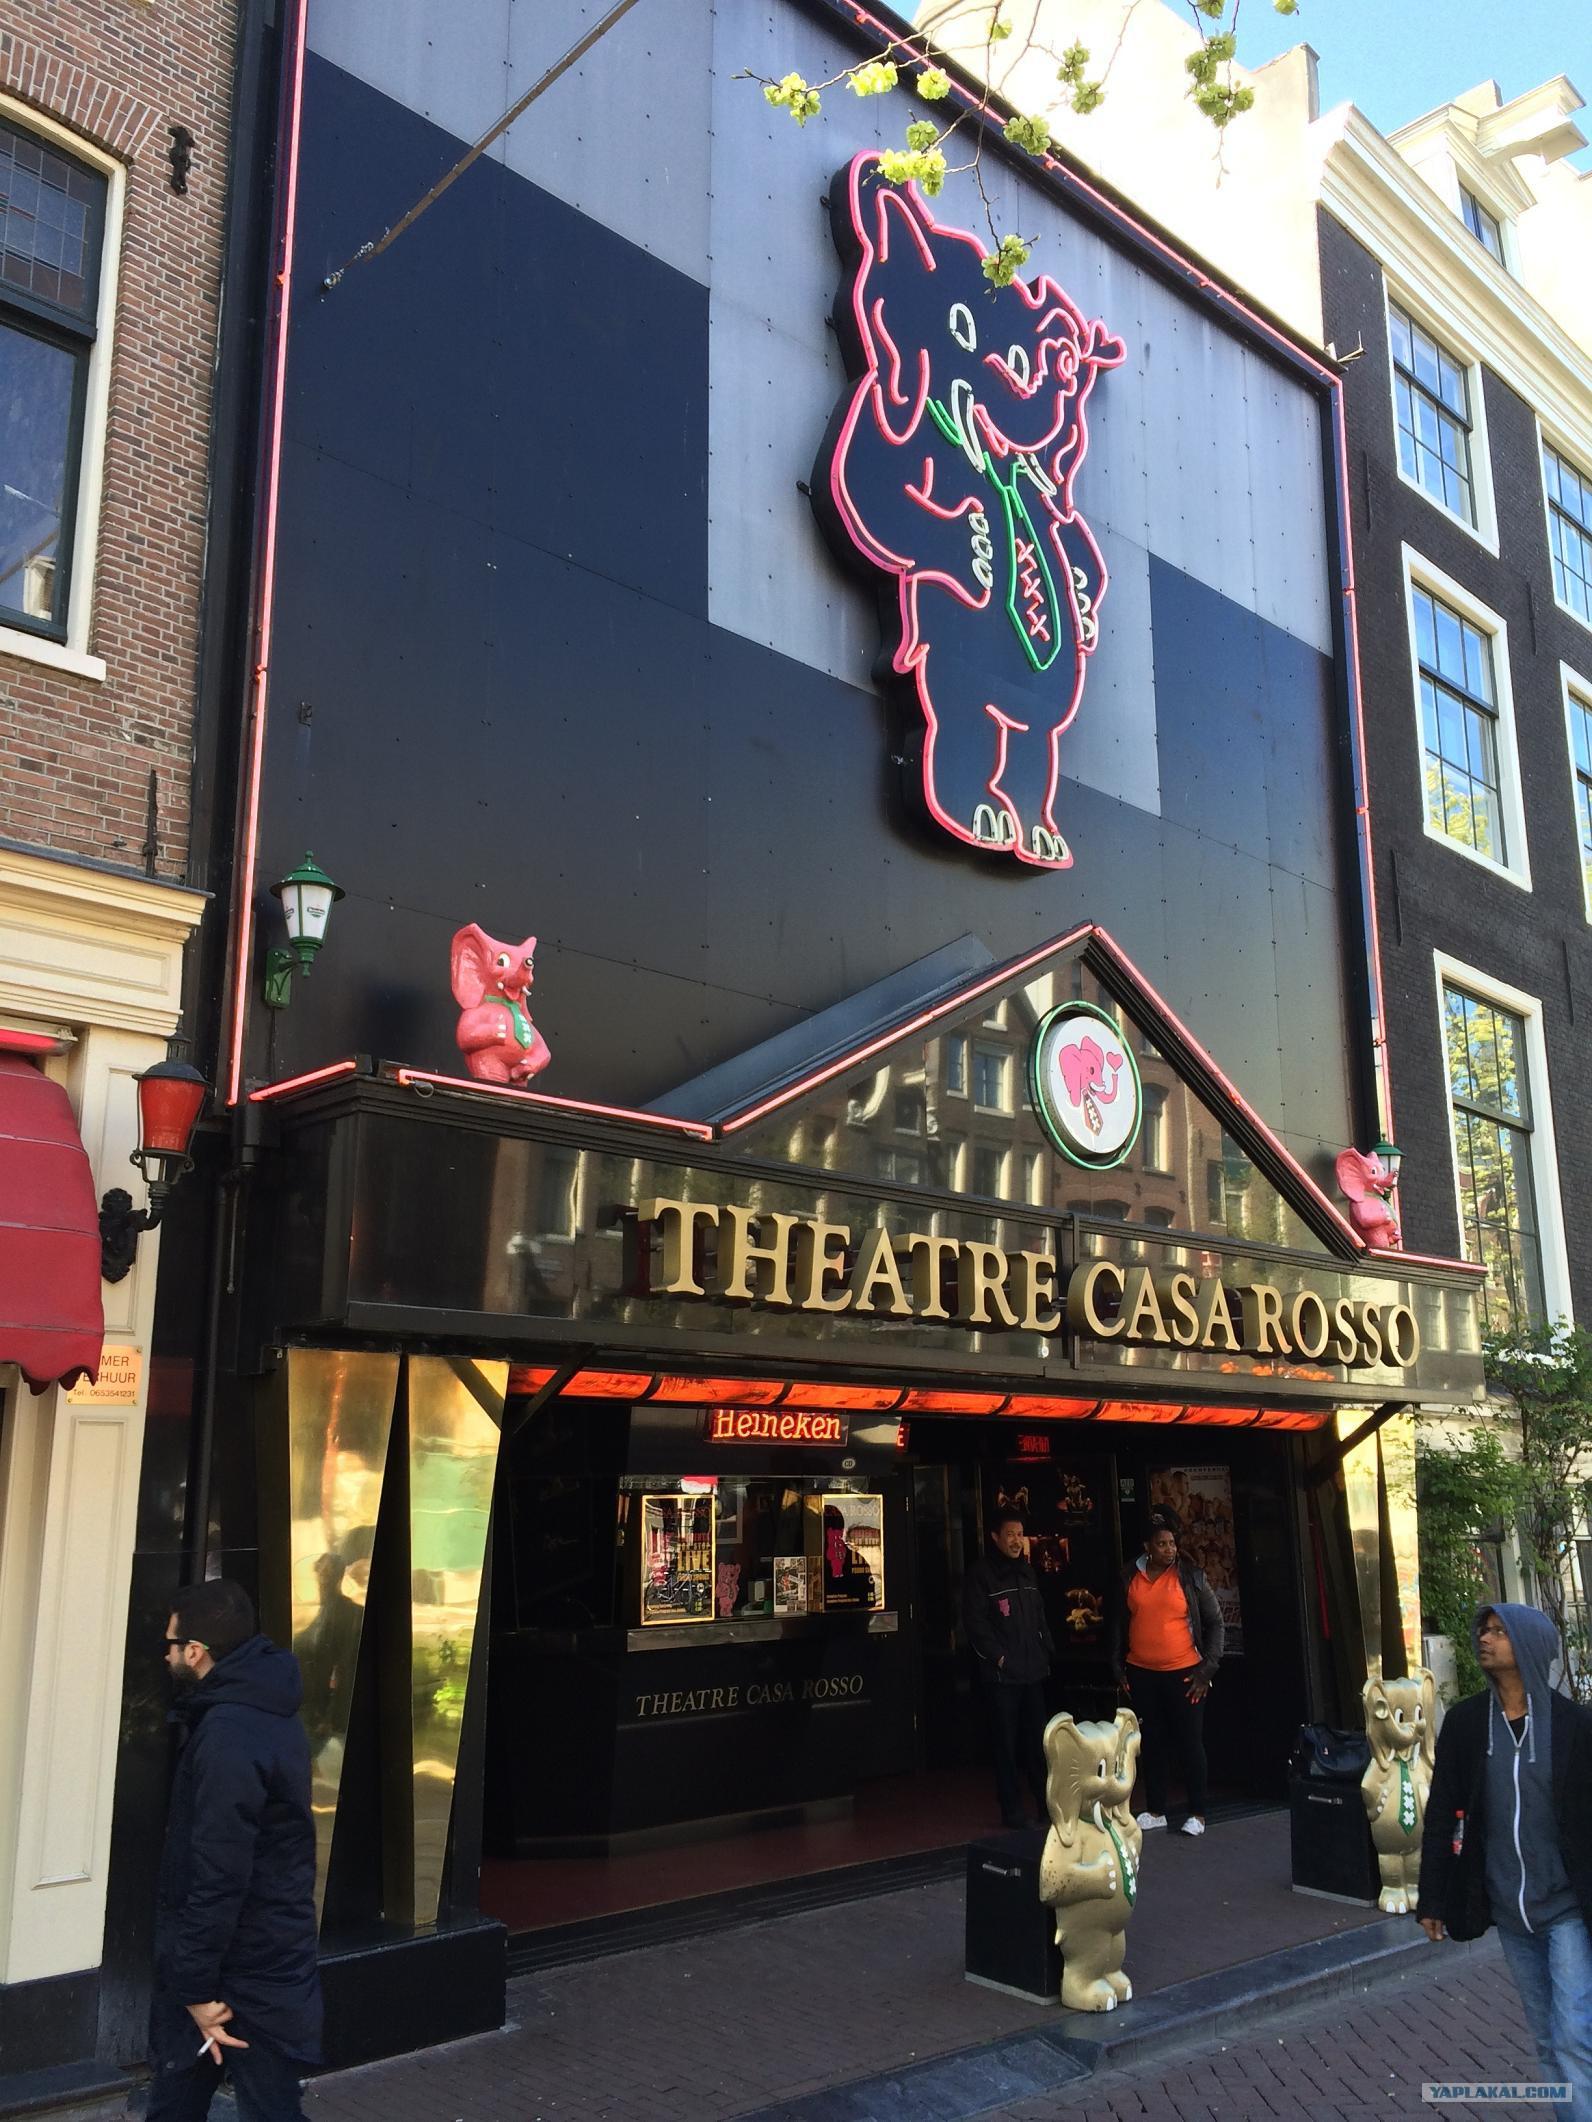 театр секса амстердам однажды операция перехвату